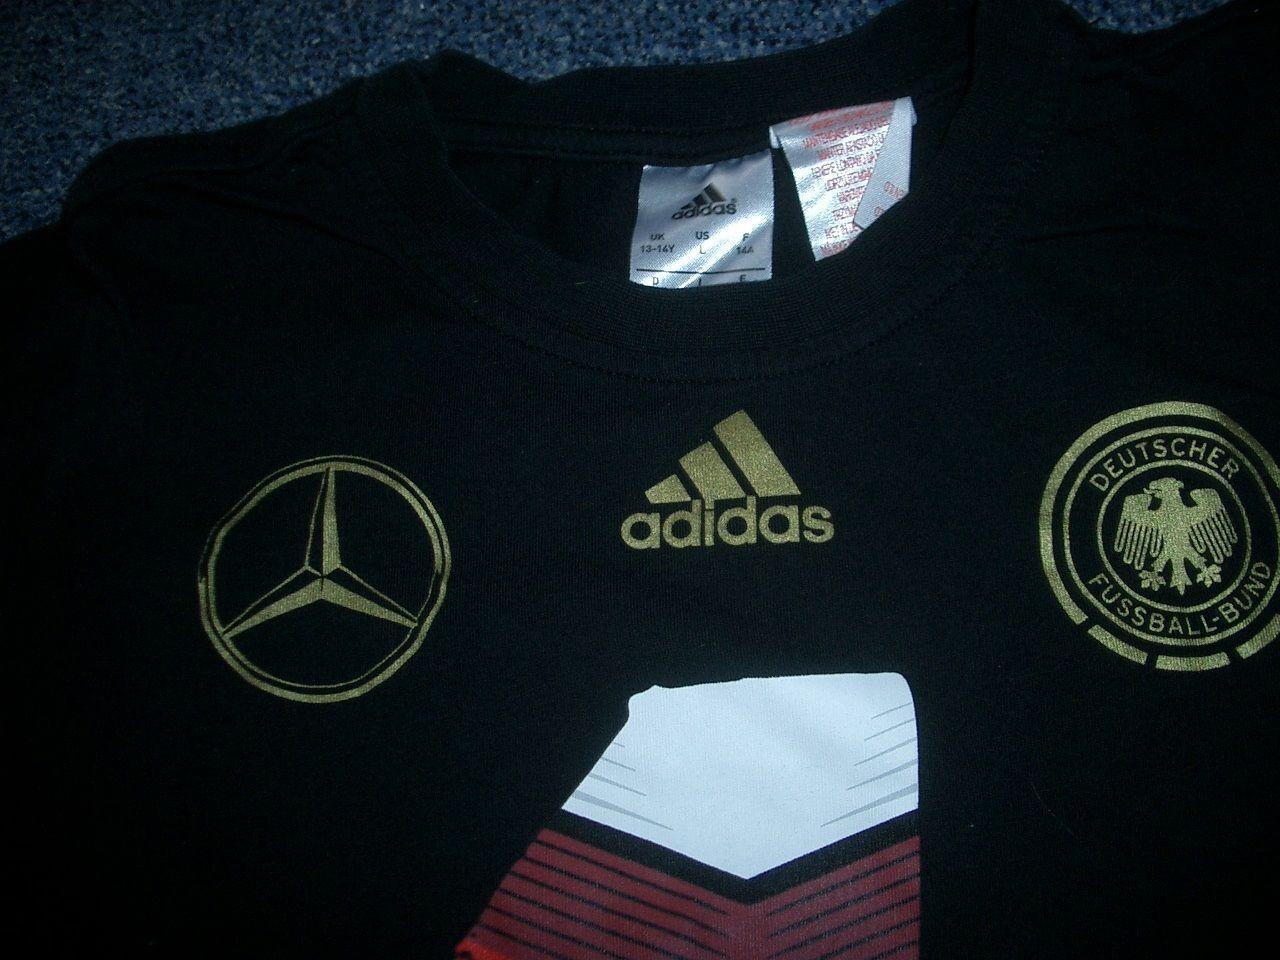 DFB - WM 2014 2014 2014 Home Coming T-Shirt 164  Schwarz m.Prints RARITÄT  COOL  NAGELNEU 5095ad